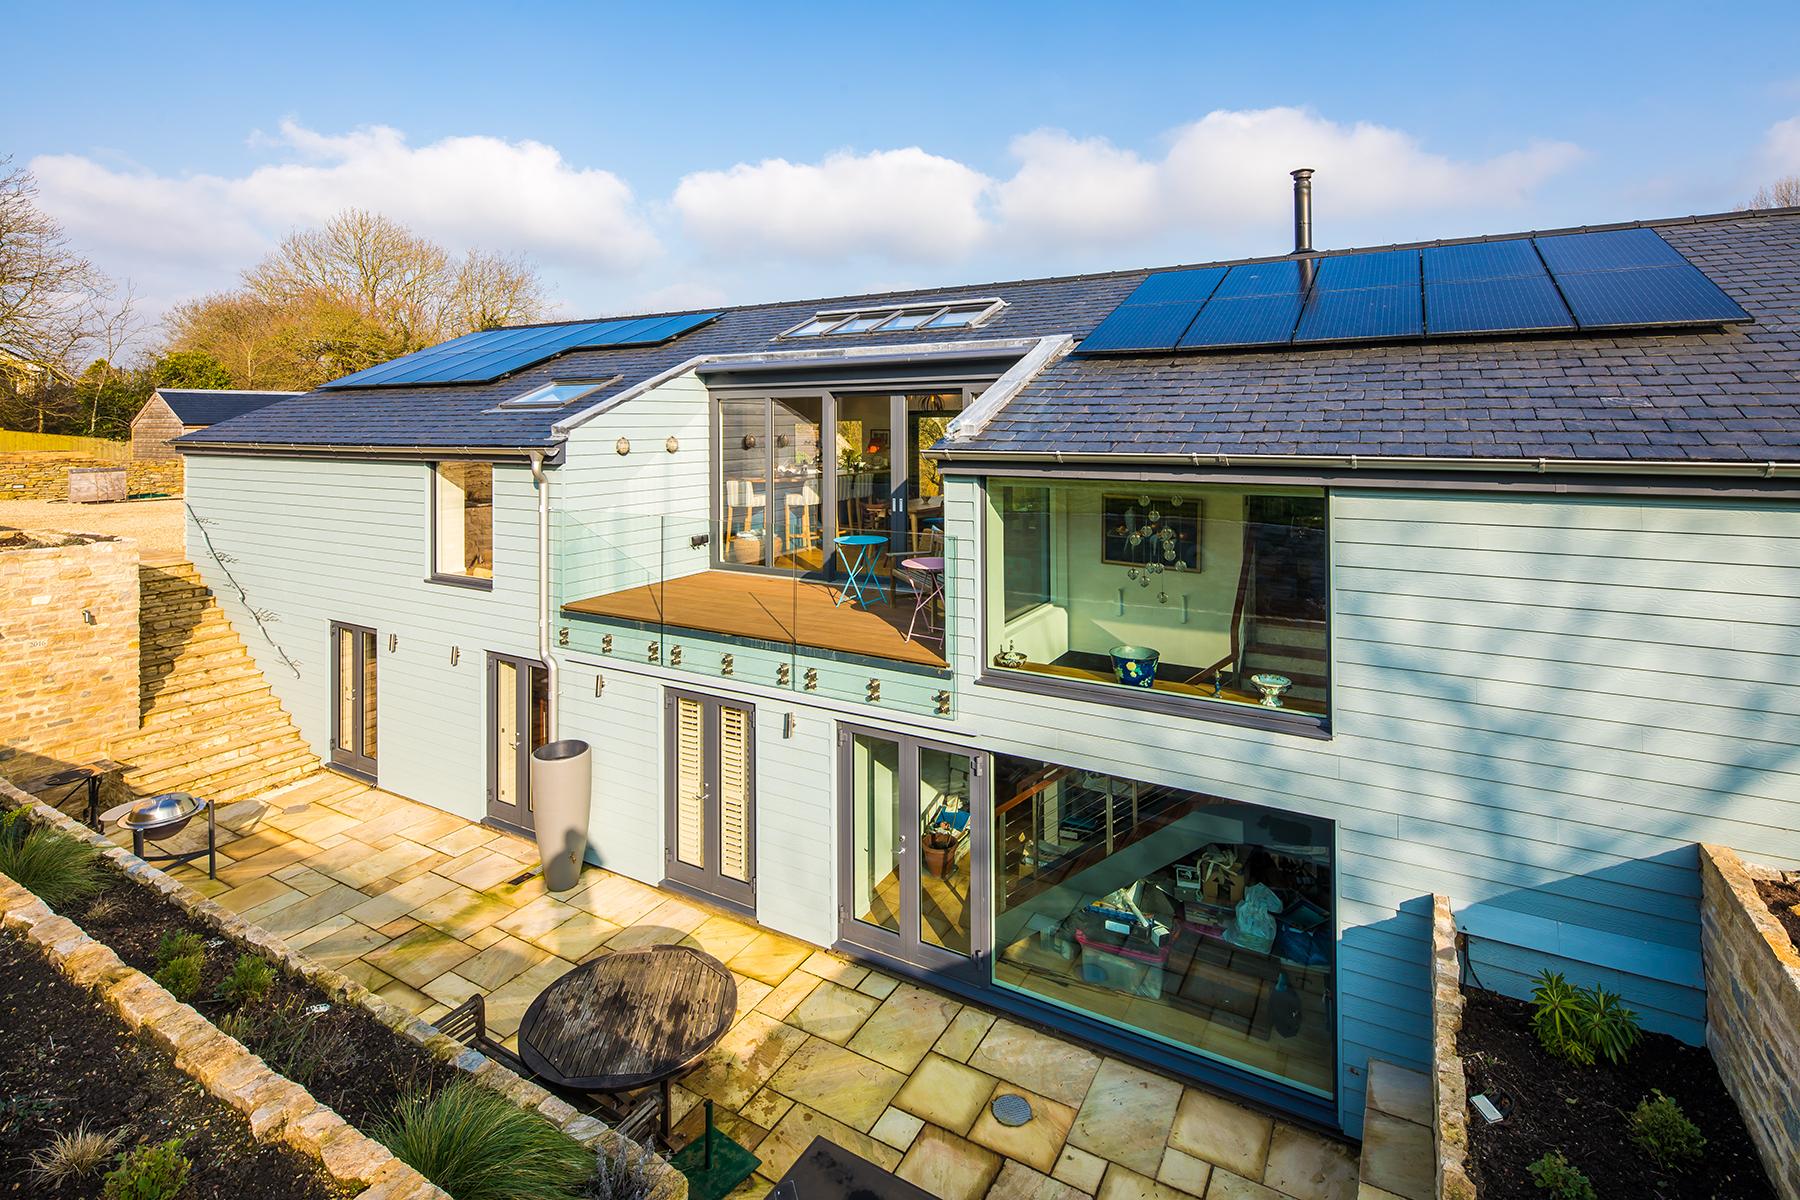 Bridport – Eco-friendly new build